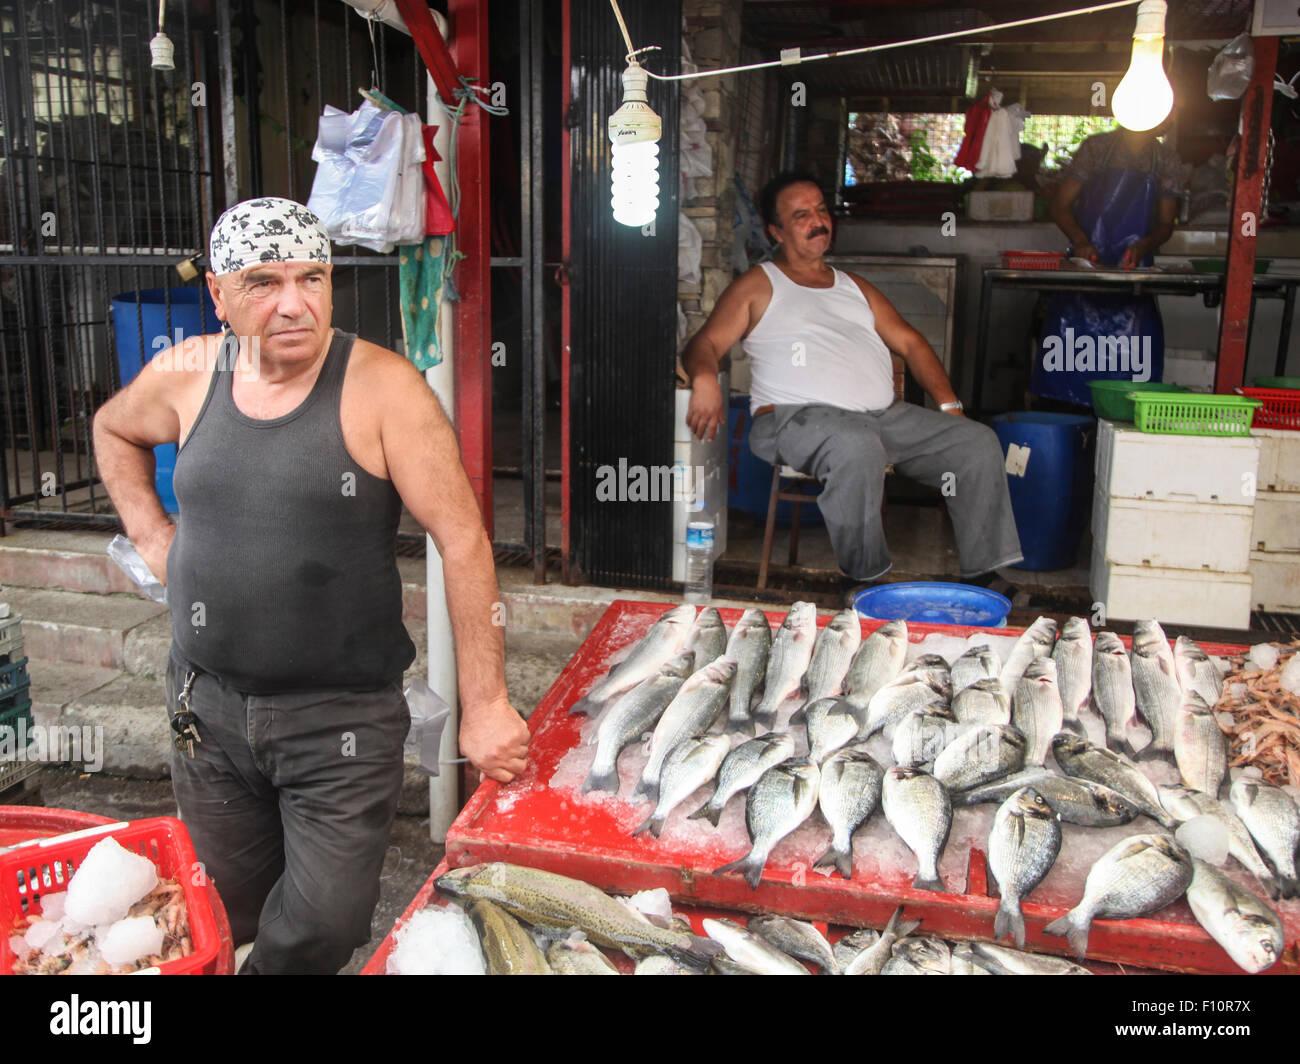 Fisherman on the market in Kusadasi, Turkey - Stock Image